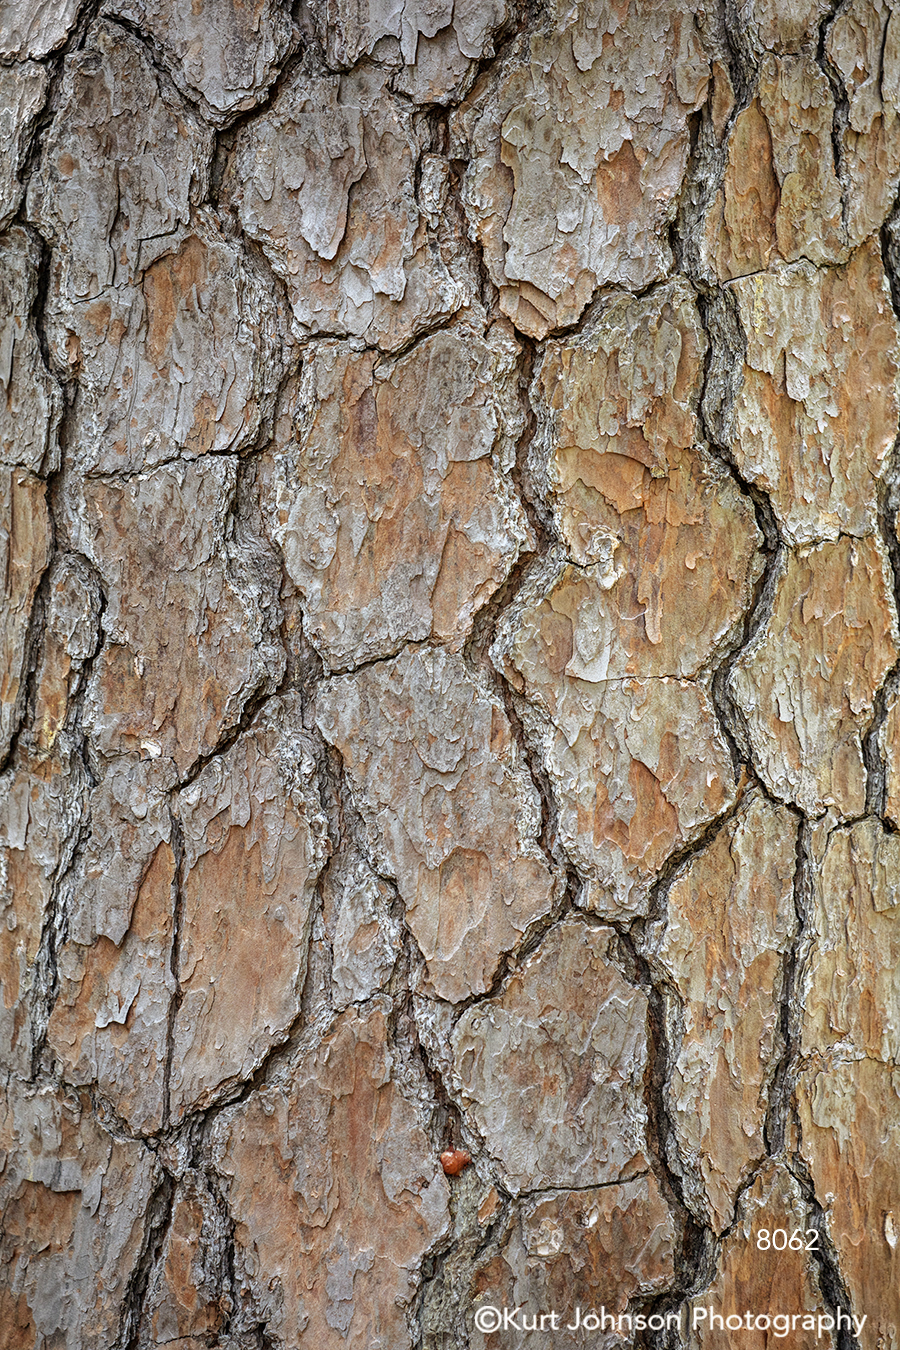 brown gray bark close up detail macro pattern tree lines texture